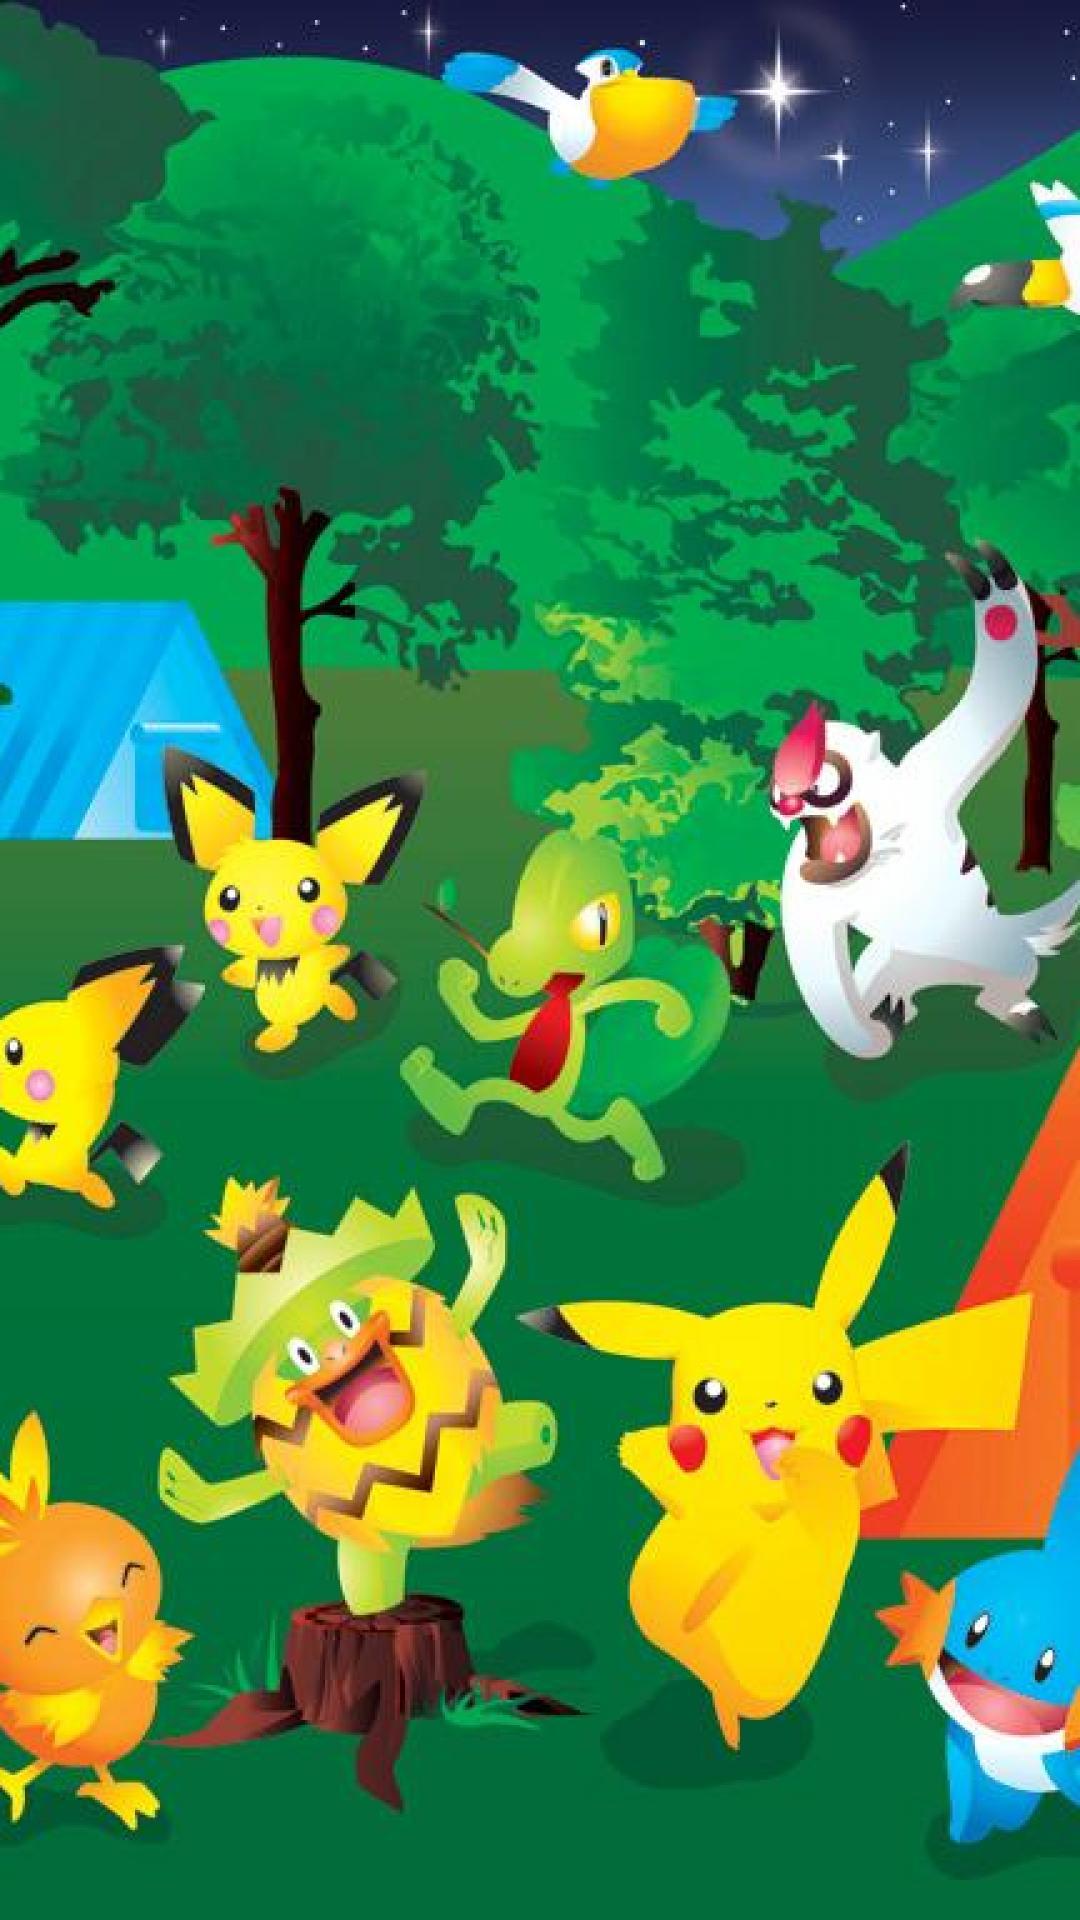 Cute Cartoon Wallpapers For Mobile Hd Free Pokemon Iphone Wallpapers Pixelstalk Net